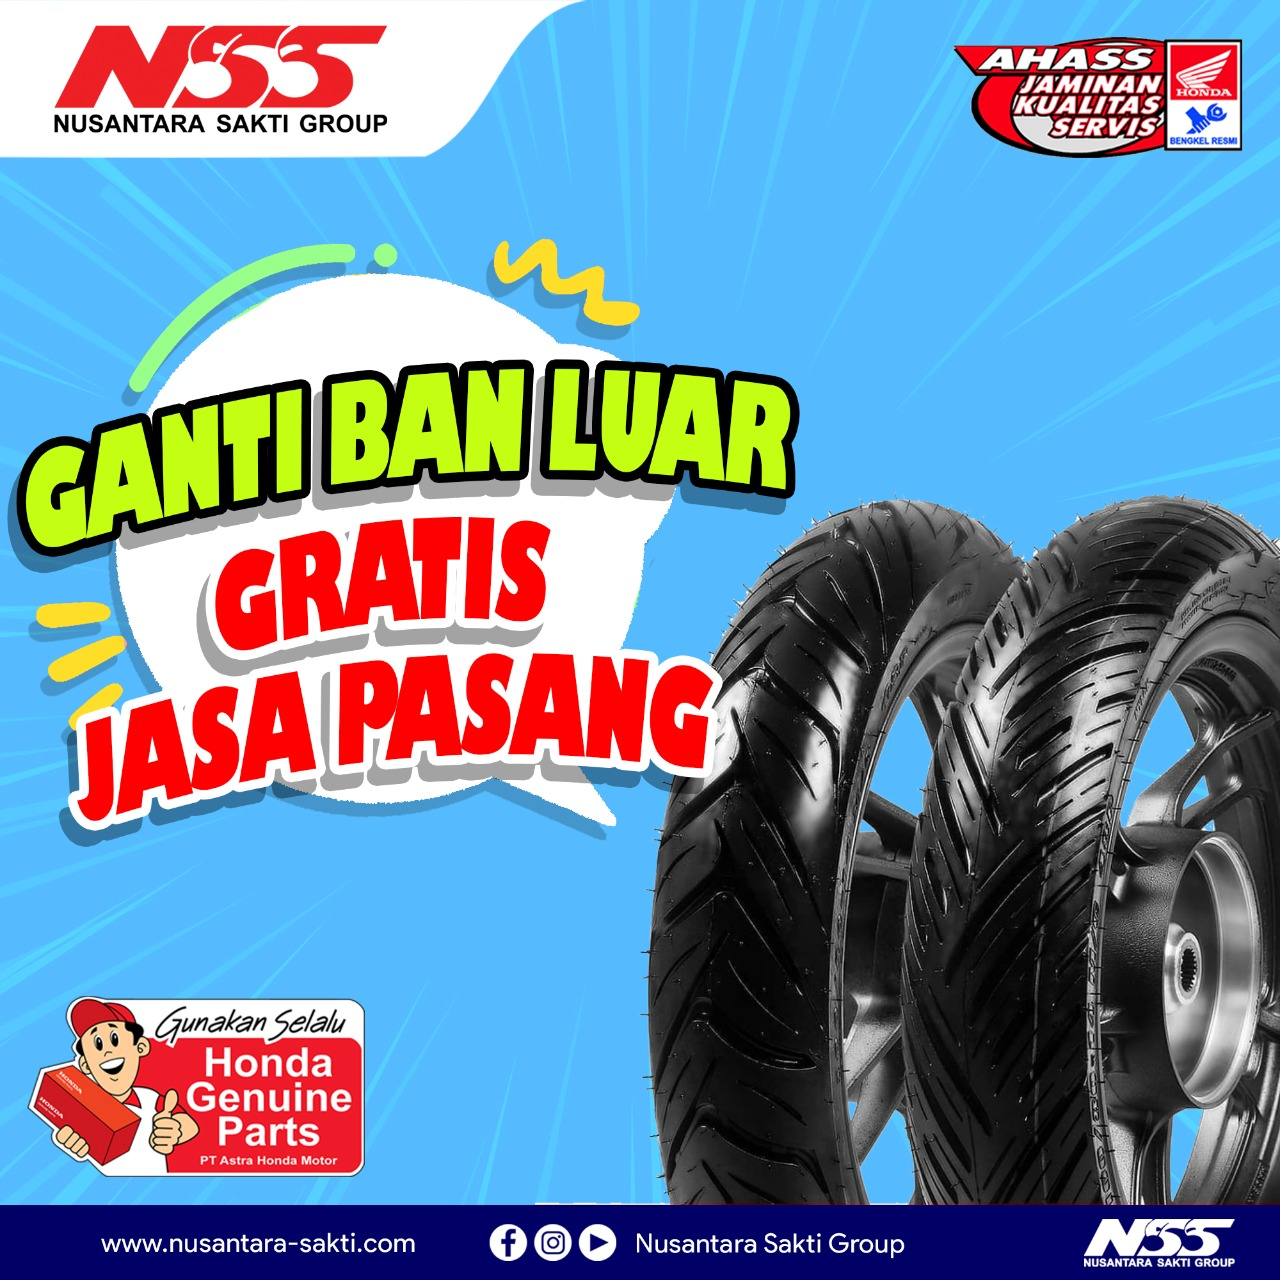 NSS Sungailiat - Promo ganti ban luar gratis jasa pasang